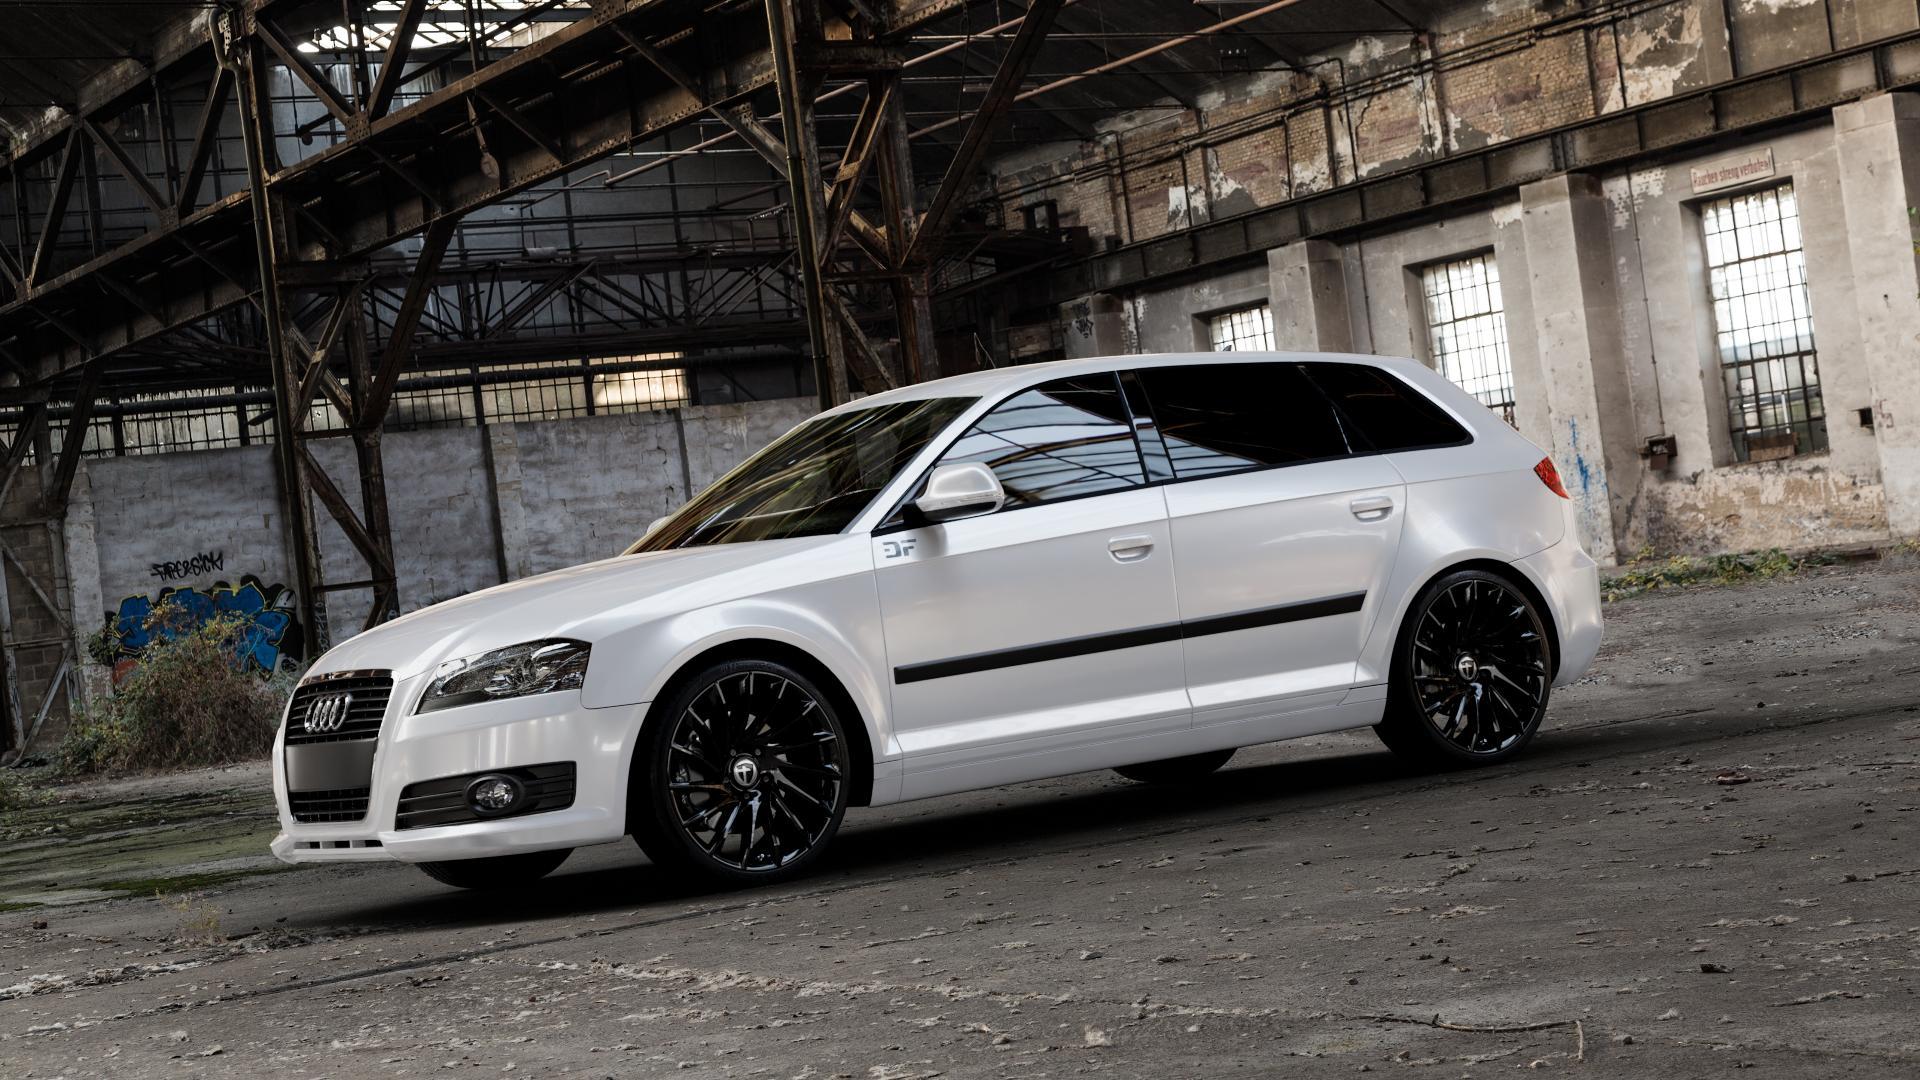 TOMASON TN16 Black painted Felge mit Reifen schwarz in 19Zoll Winterfelge Alufelge auf weissem Audi A3 Typ 8P (Sportback) 1,6l 75kW (102 PS) 2,0l FSI 110kW (150 1,9l TDI 77kW (105 103kW (140 TFSI 147kW (200 85kW (116 100kW (136 1,8l 118kW (160 125kW (170 1,4l 92kW (125 120kW (163 quattro 3,2l V6 184kW (250 S3 195kW (265 1,2l 66kW (90 18